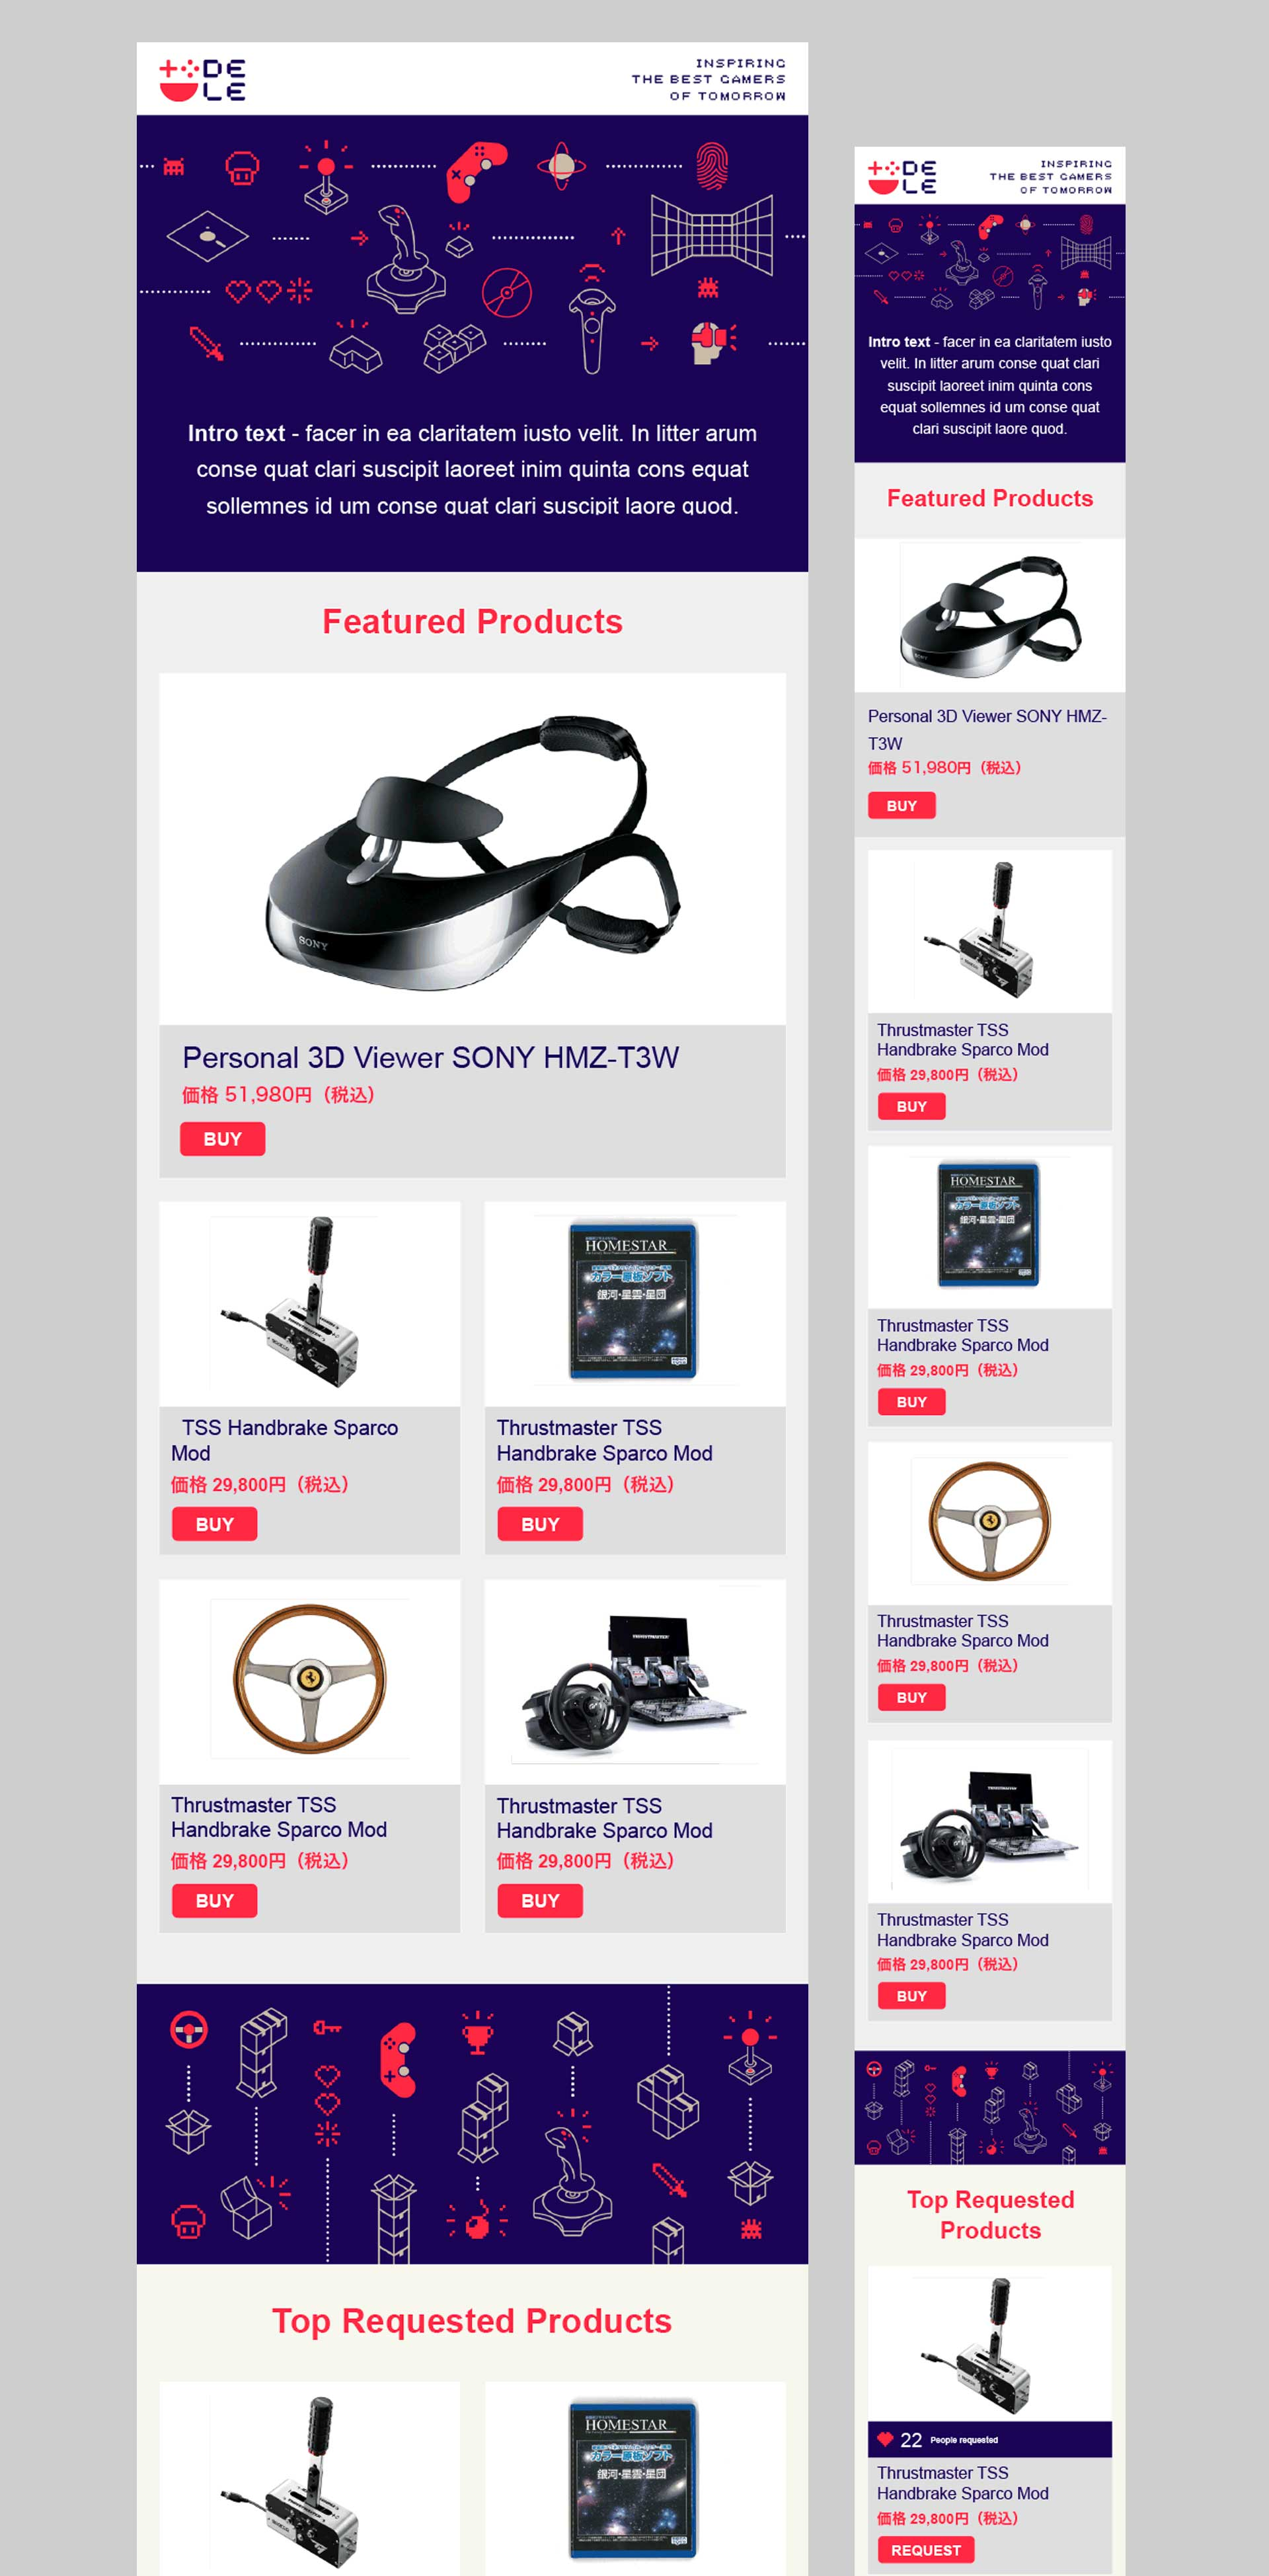 DELE - Gaming Accessory Retailer - Branding, Identity Design, Illustration, UI/UX design and print